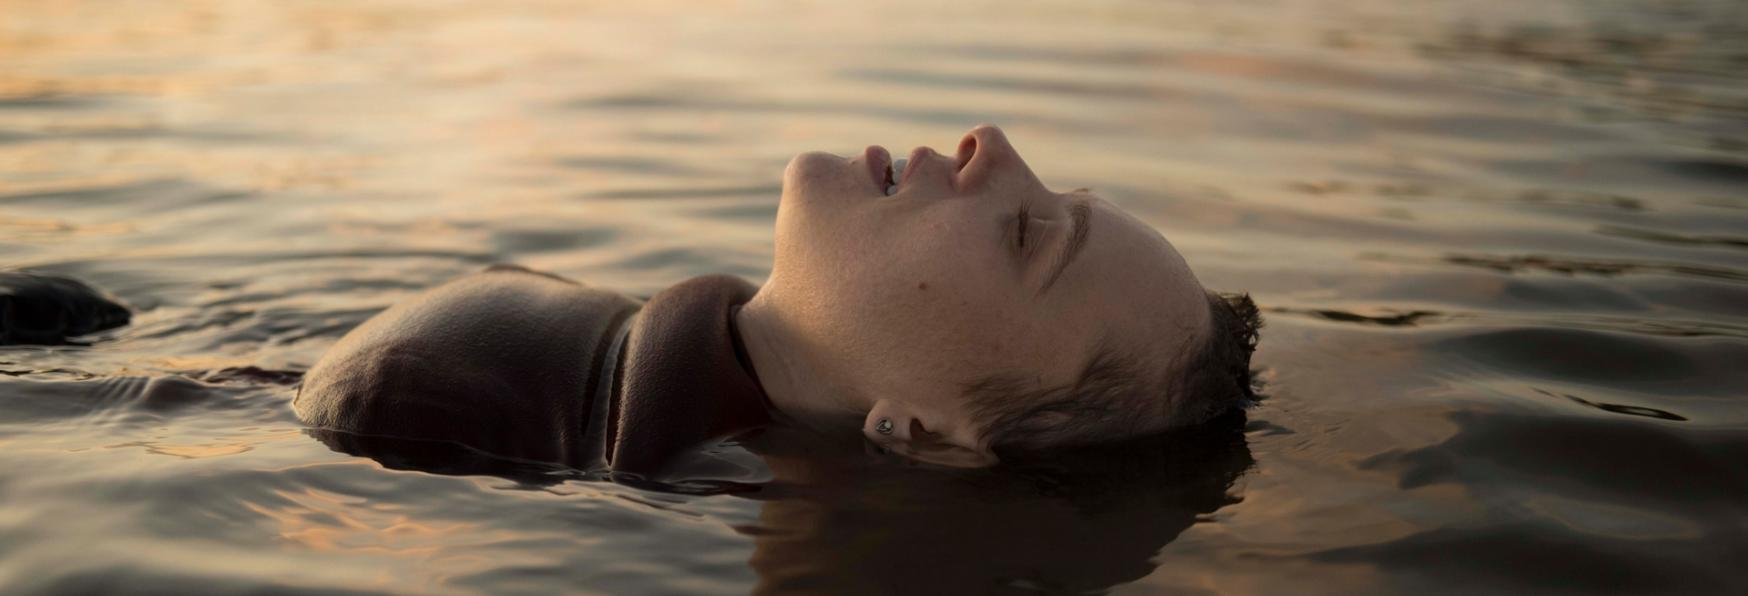 Unorthodox: la Recensione della Miniserie targata Netflix basata sull'Autobiografia di Deborah Feldman